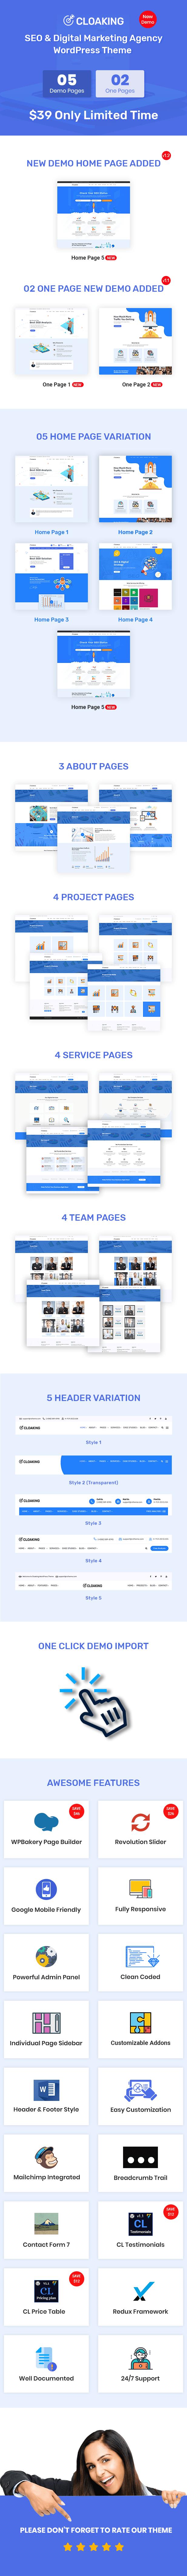 Cloaking - SEO & Digital Marketing Agency WordPress Theme - 3